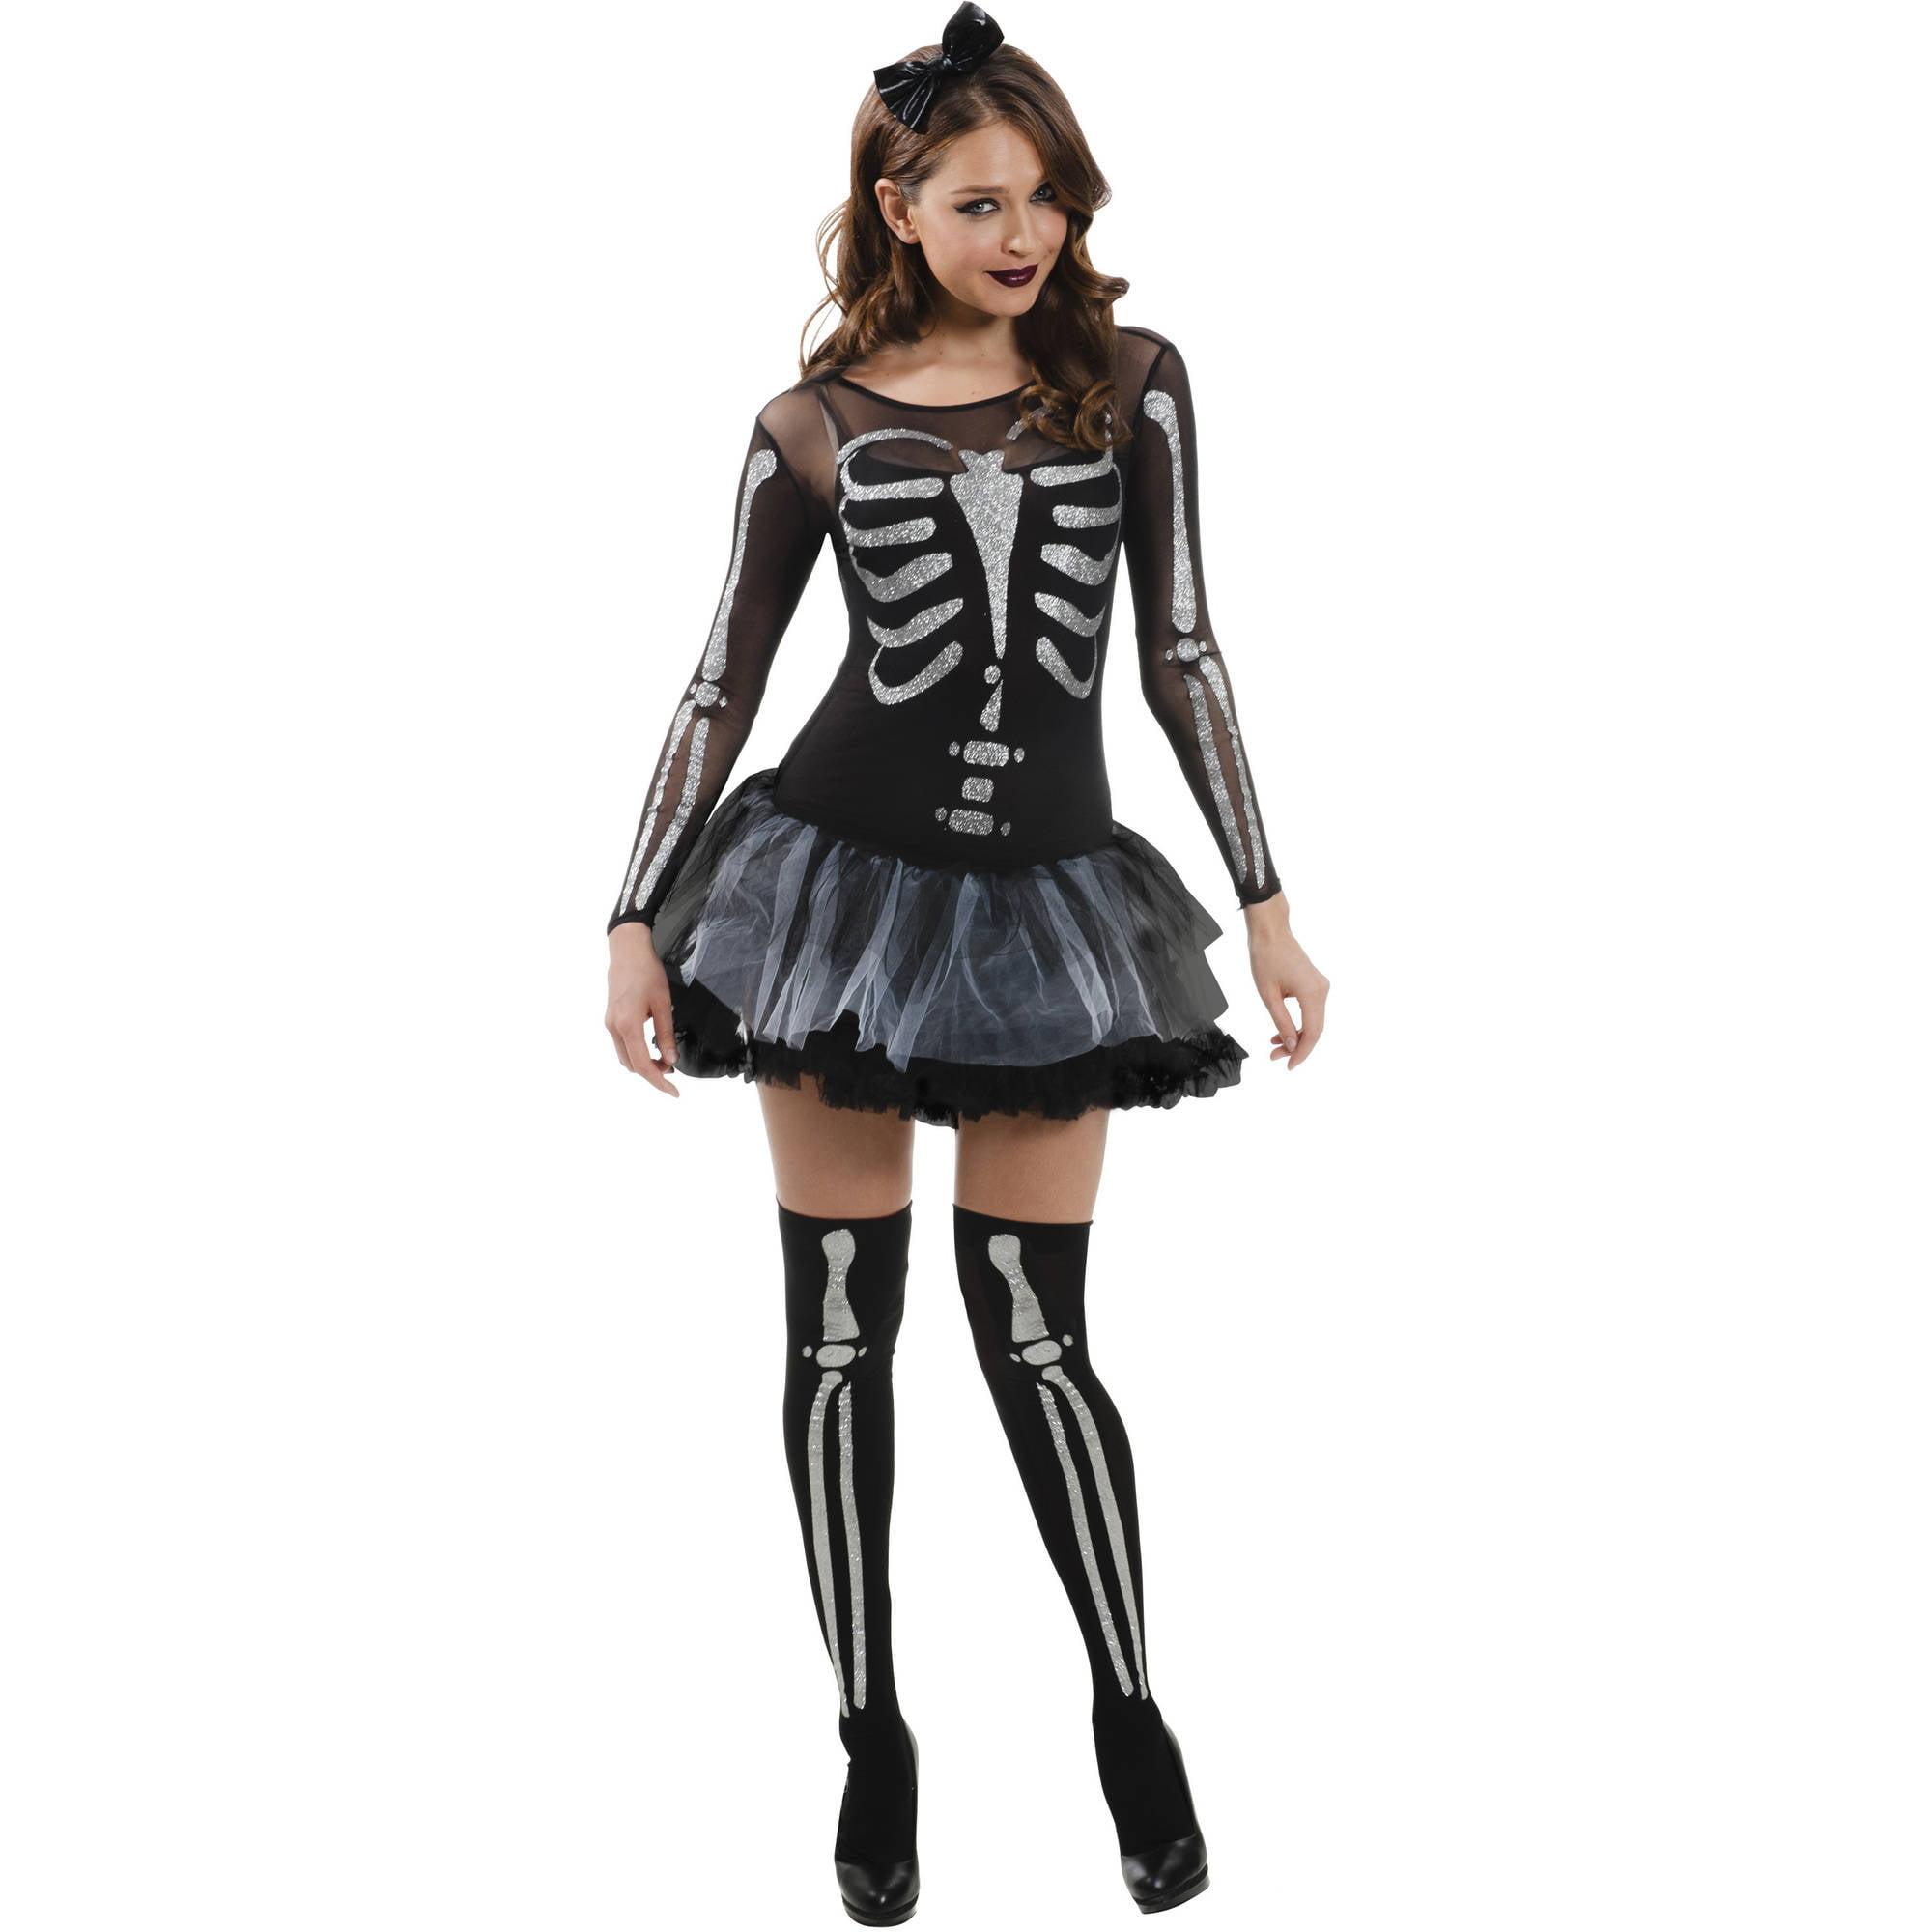 sassy skeleton adult halloween costume walmartcom